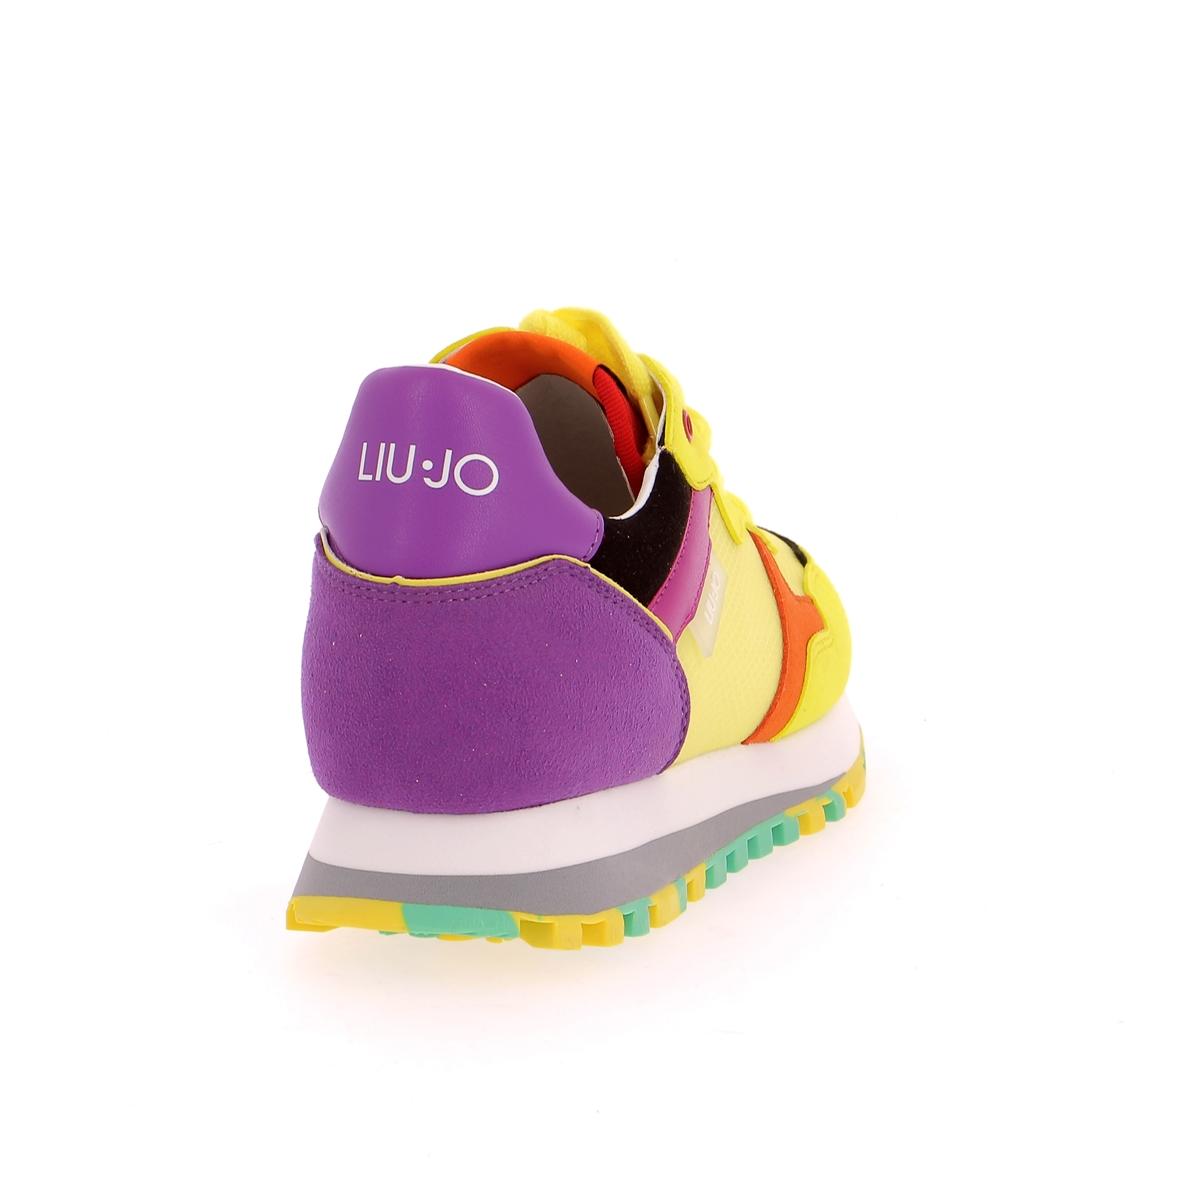 Liu Jo Sneakers geel